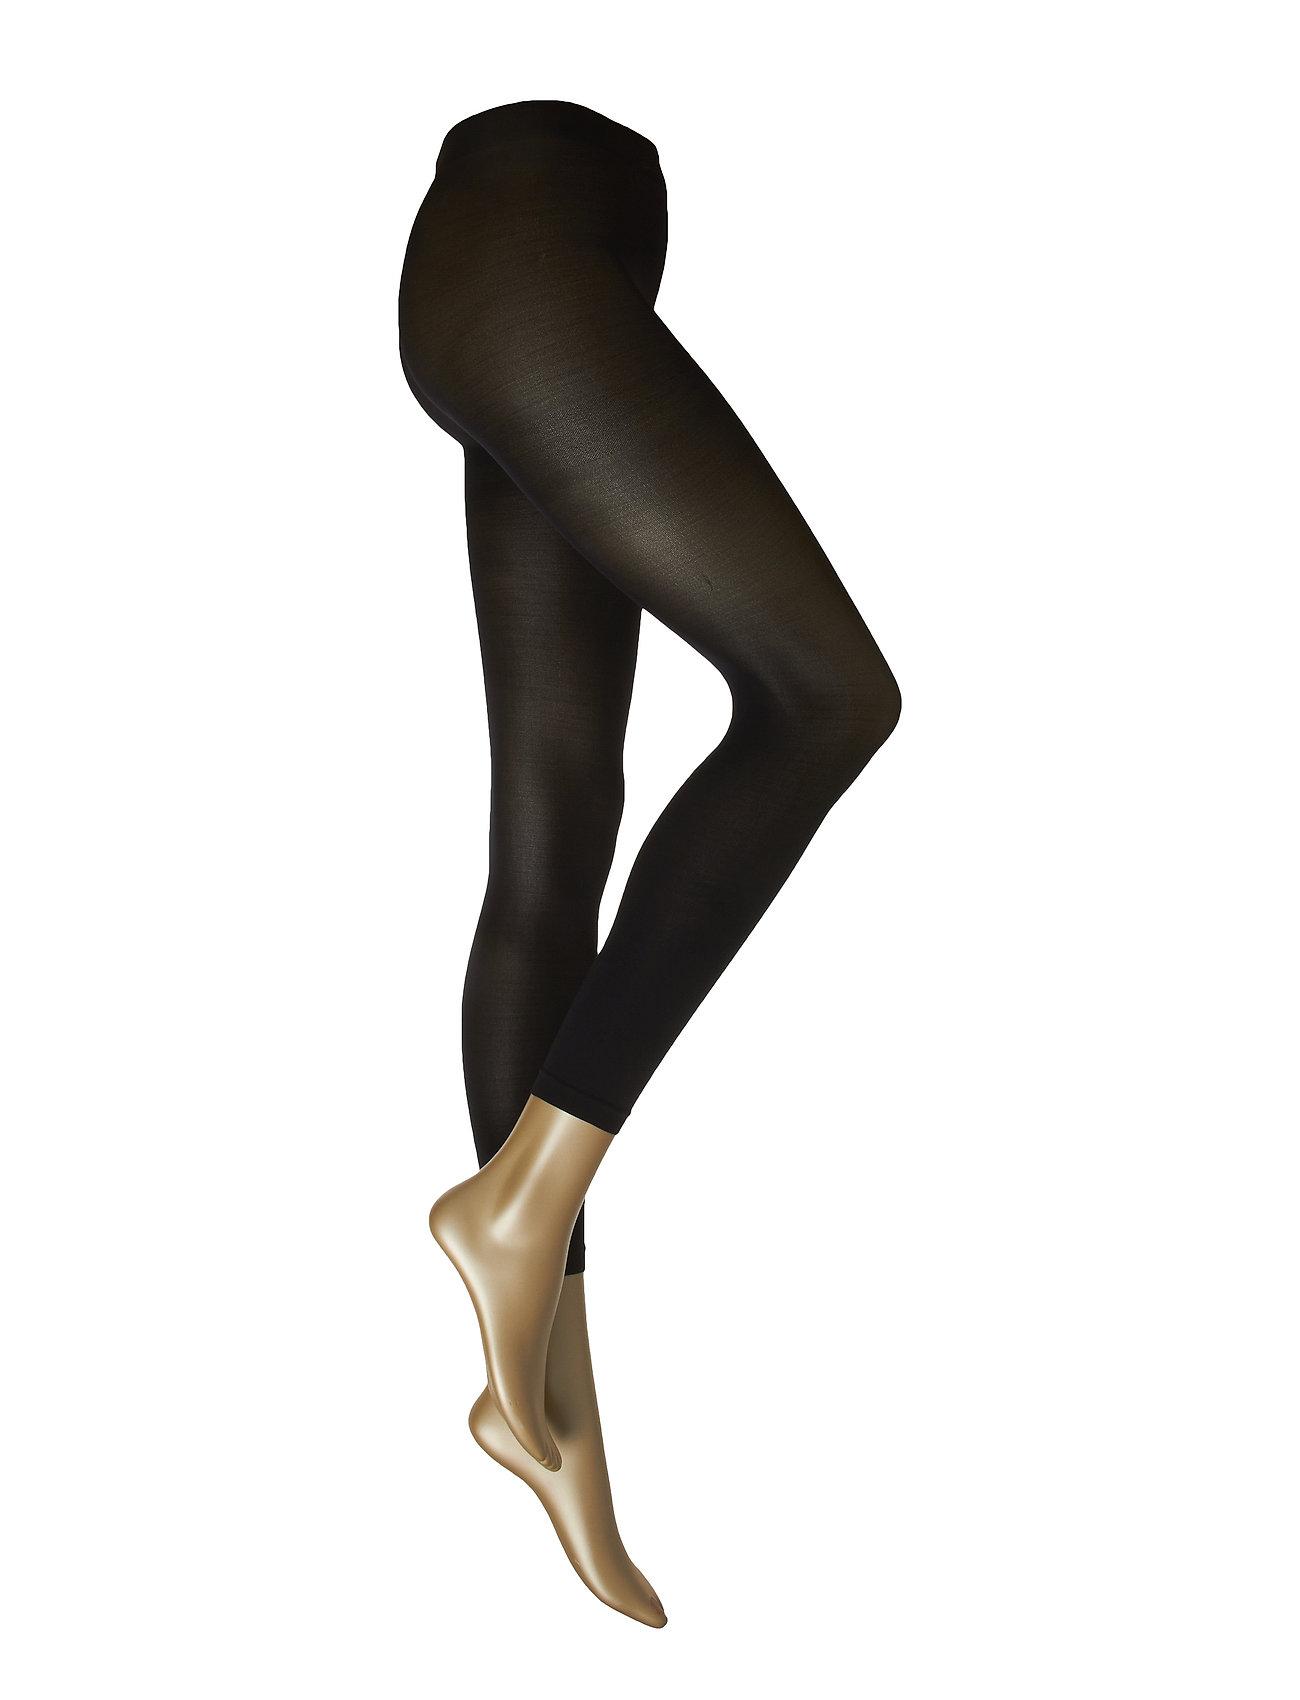 Decoy DECOY leggings microfiber 40 d - BLACK